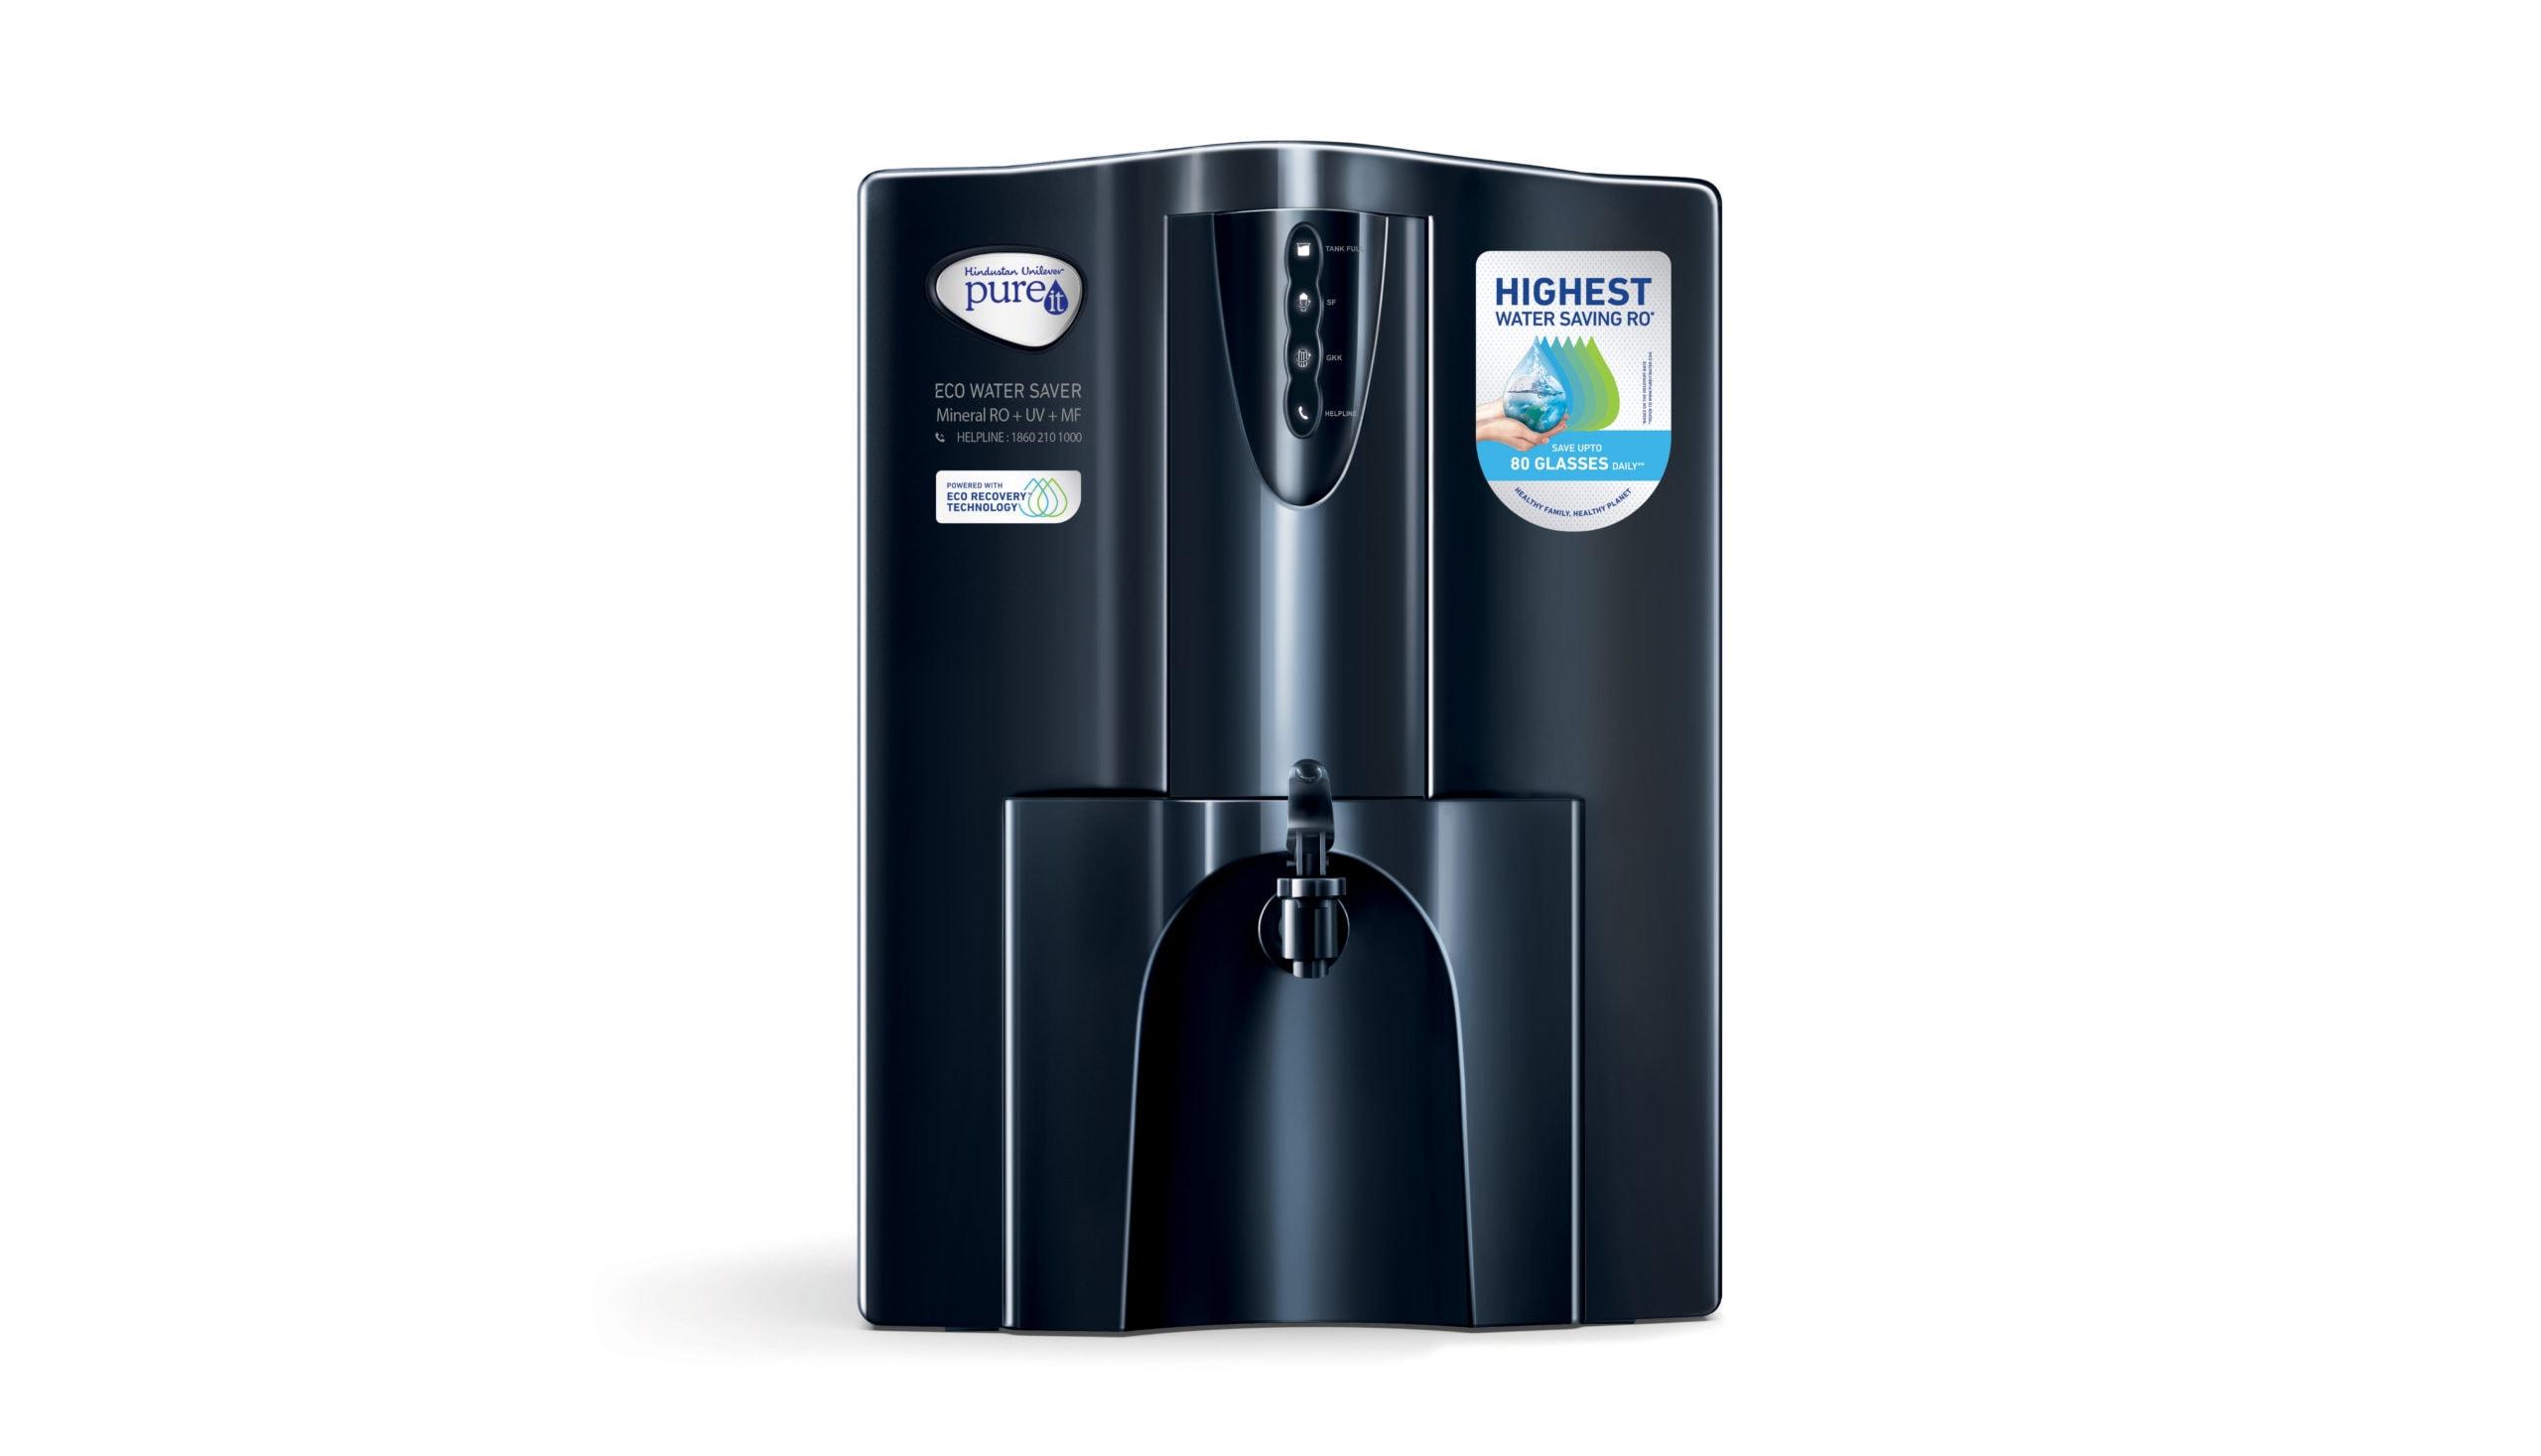 Pureit Eco Water Saver